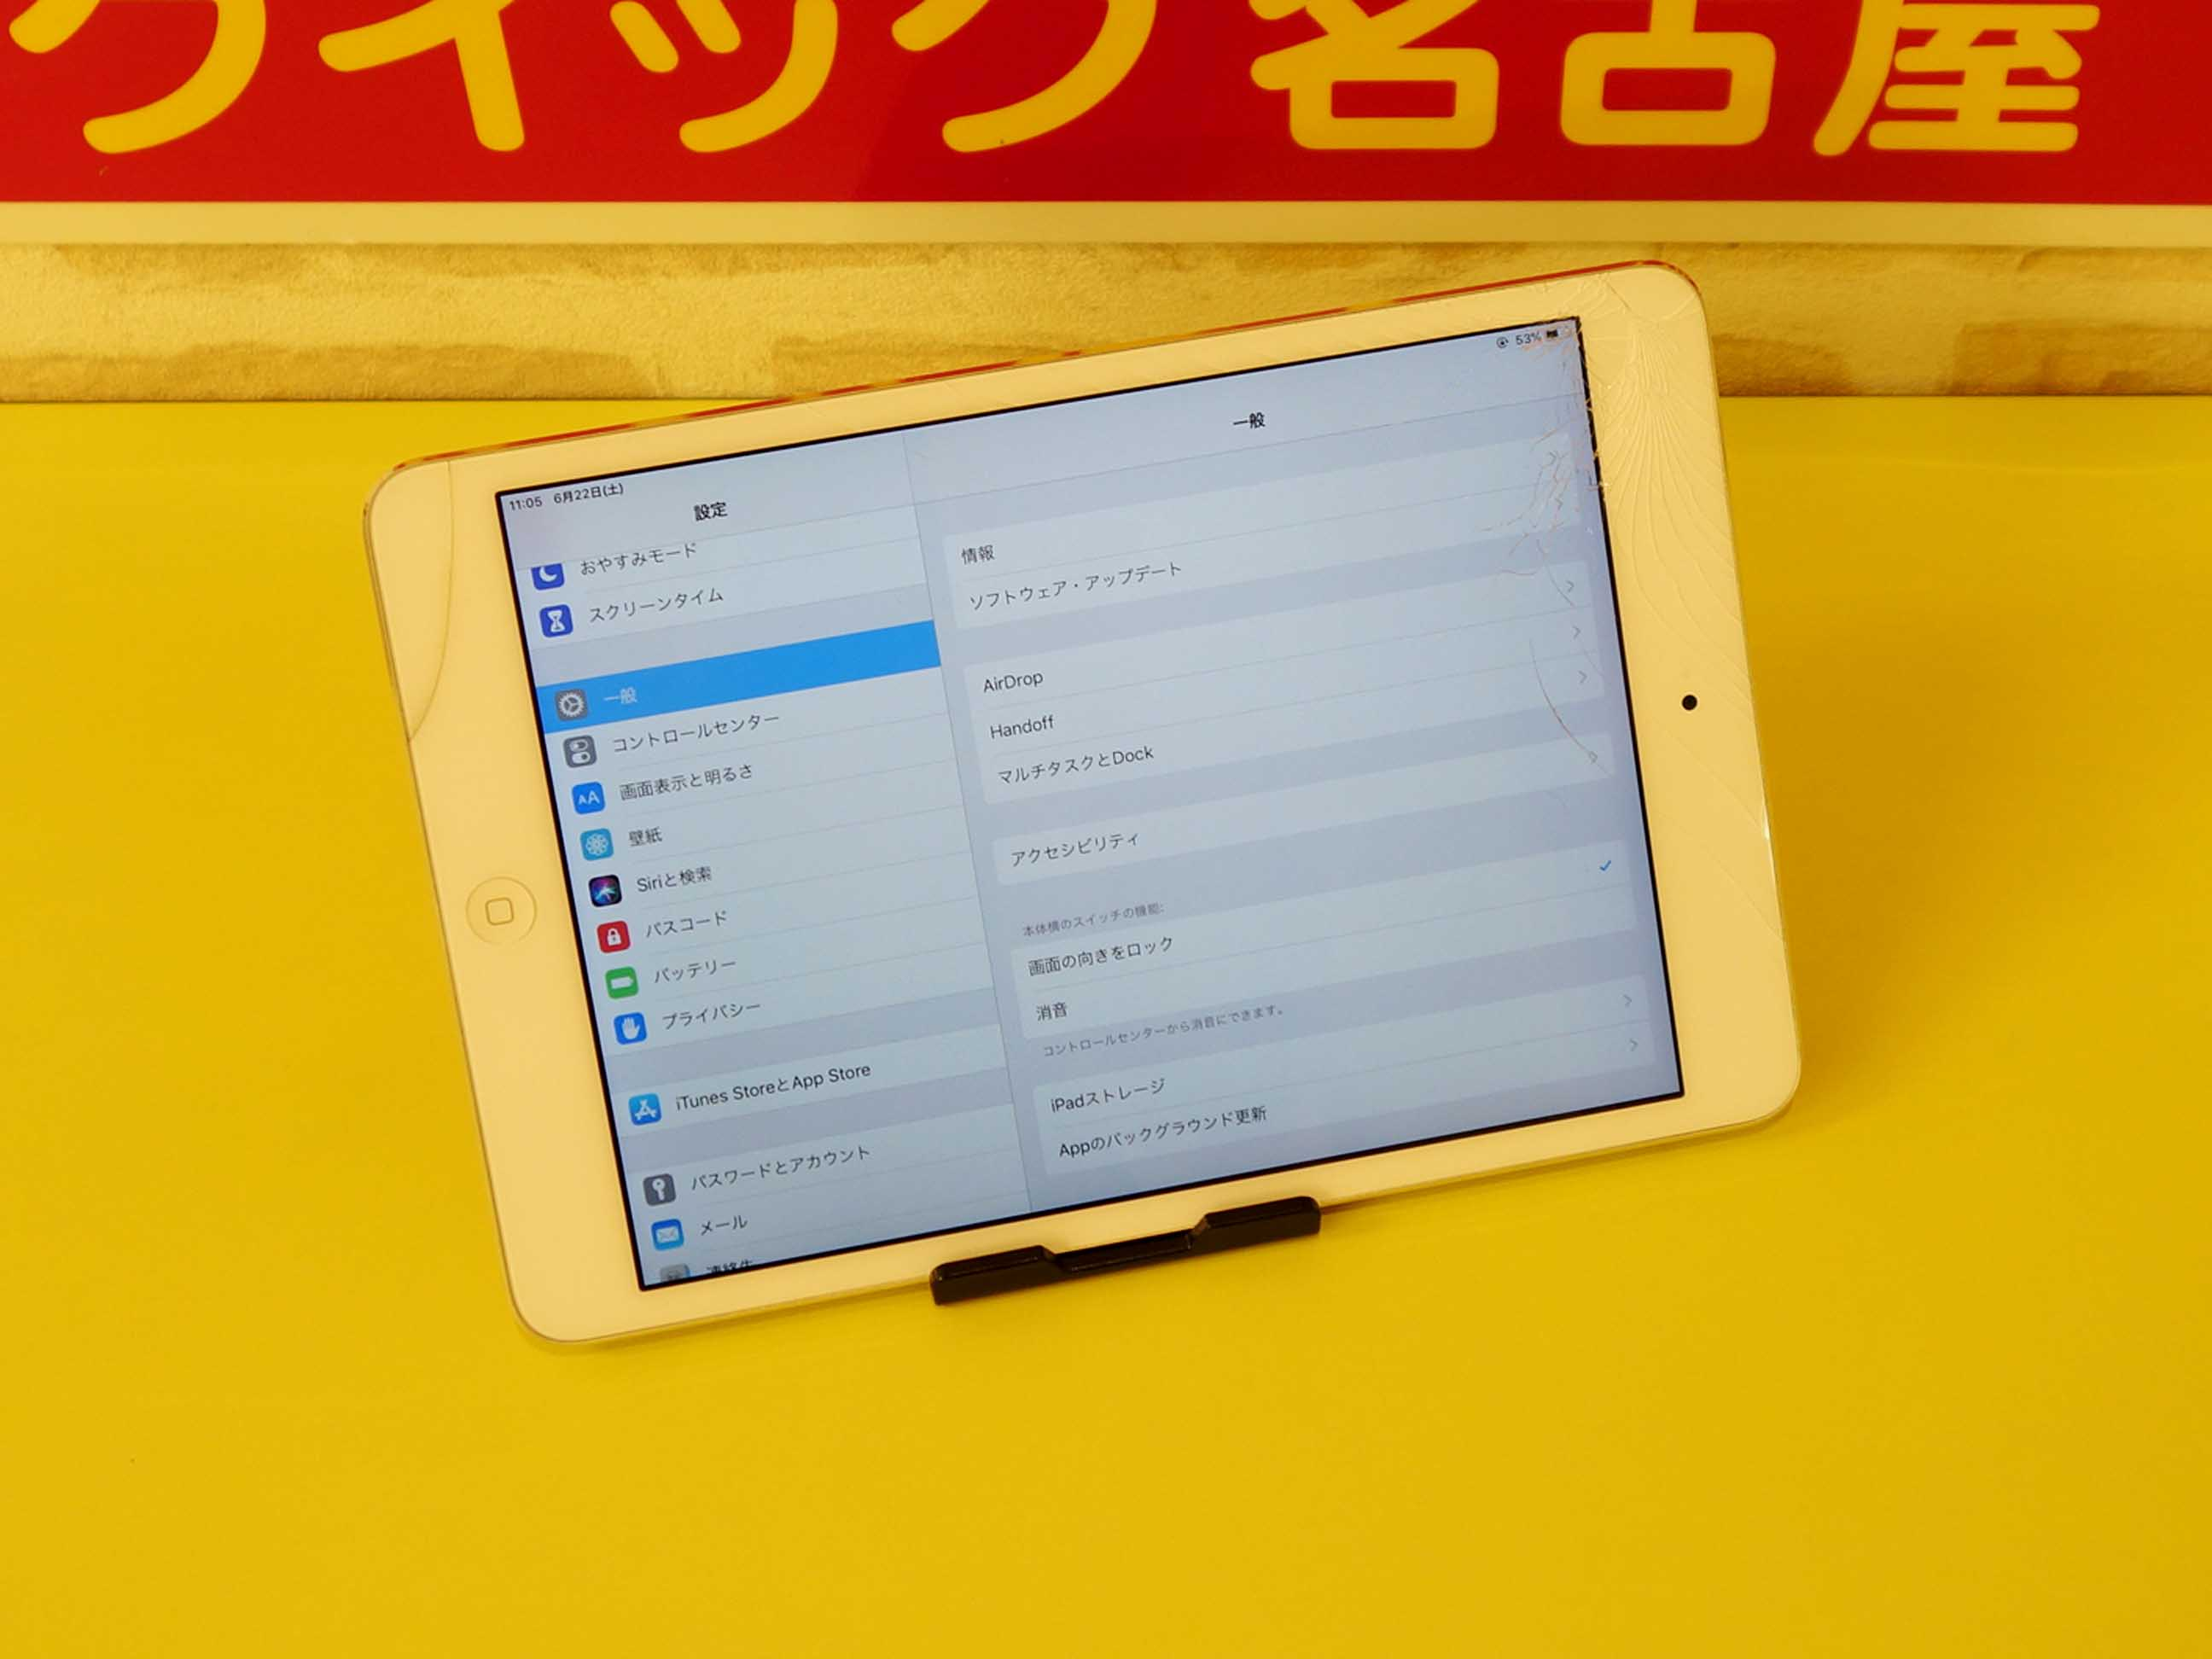 iPadminiのガラス交換修理に名古屋市内よりご来店!アイパッド修理もクイック名古屋